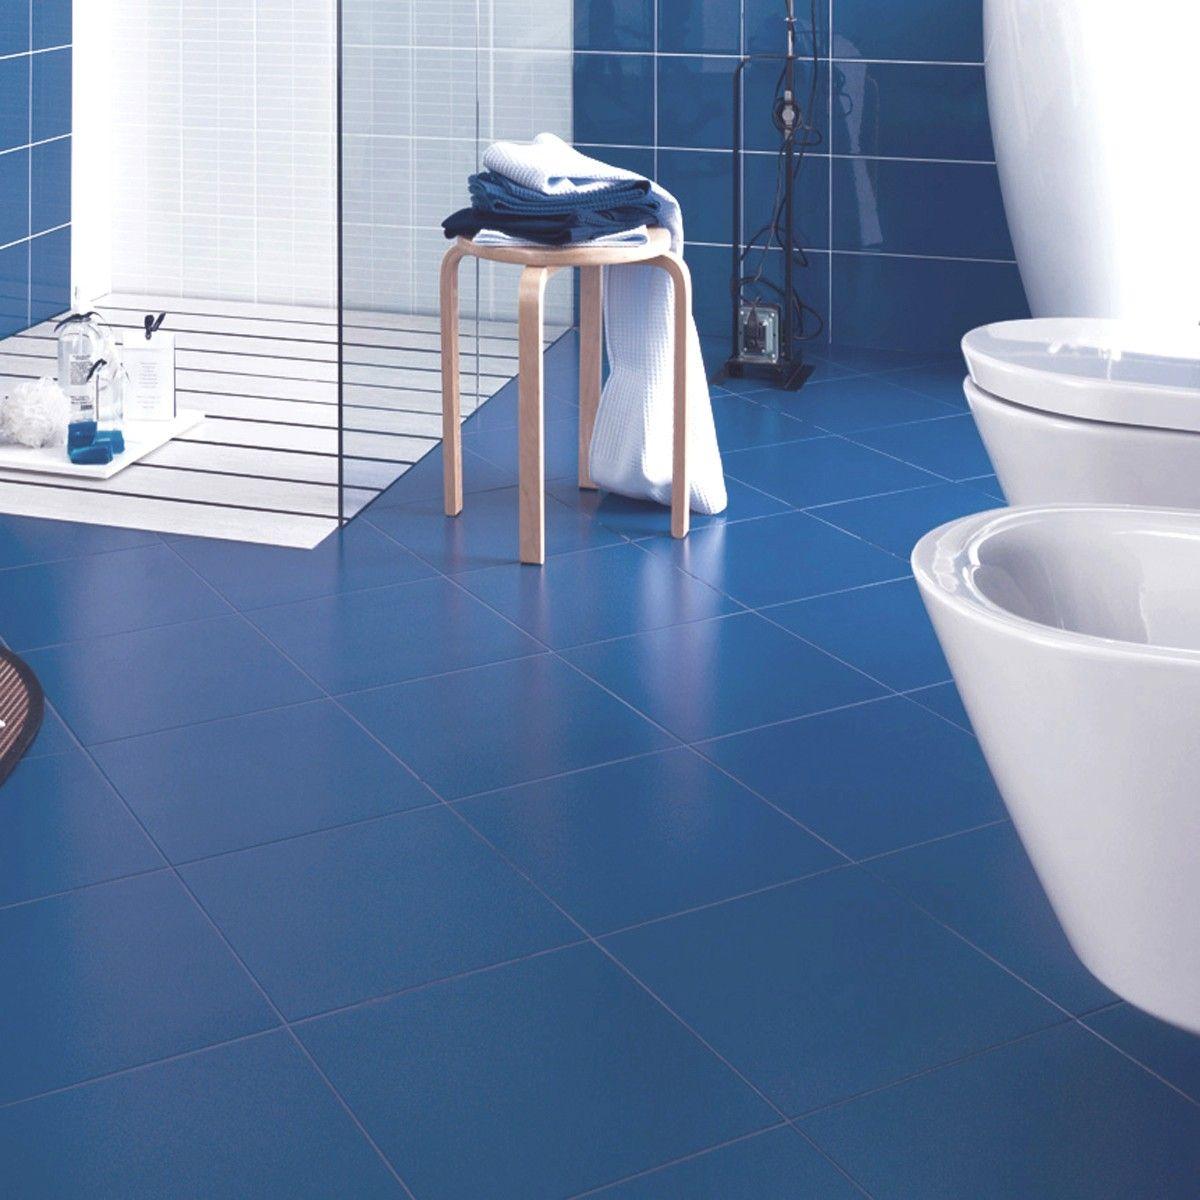 316x316 mono colore cobalto tile choice tile choice floors mono colore cobalto ceramic plain floor tile from tile choice with next day delivery doublecrazyfo Image collections